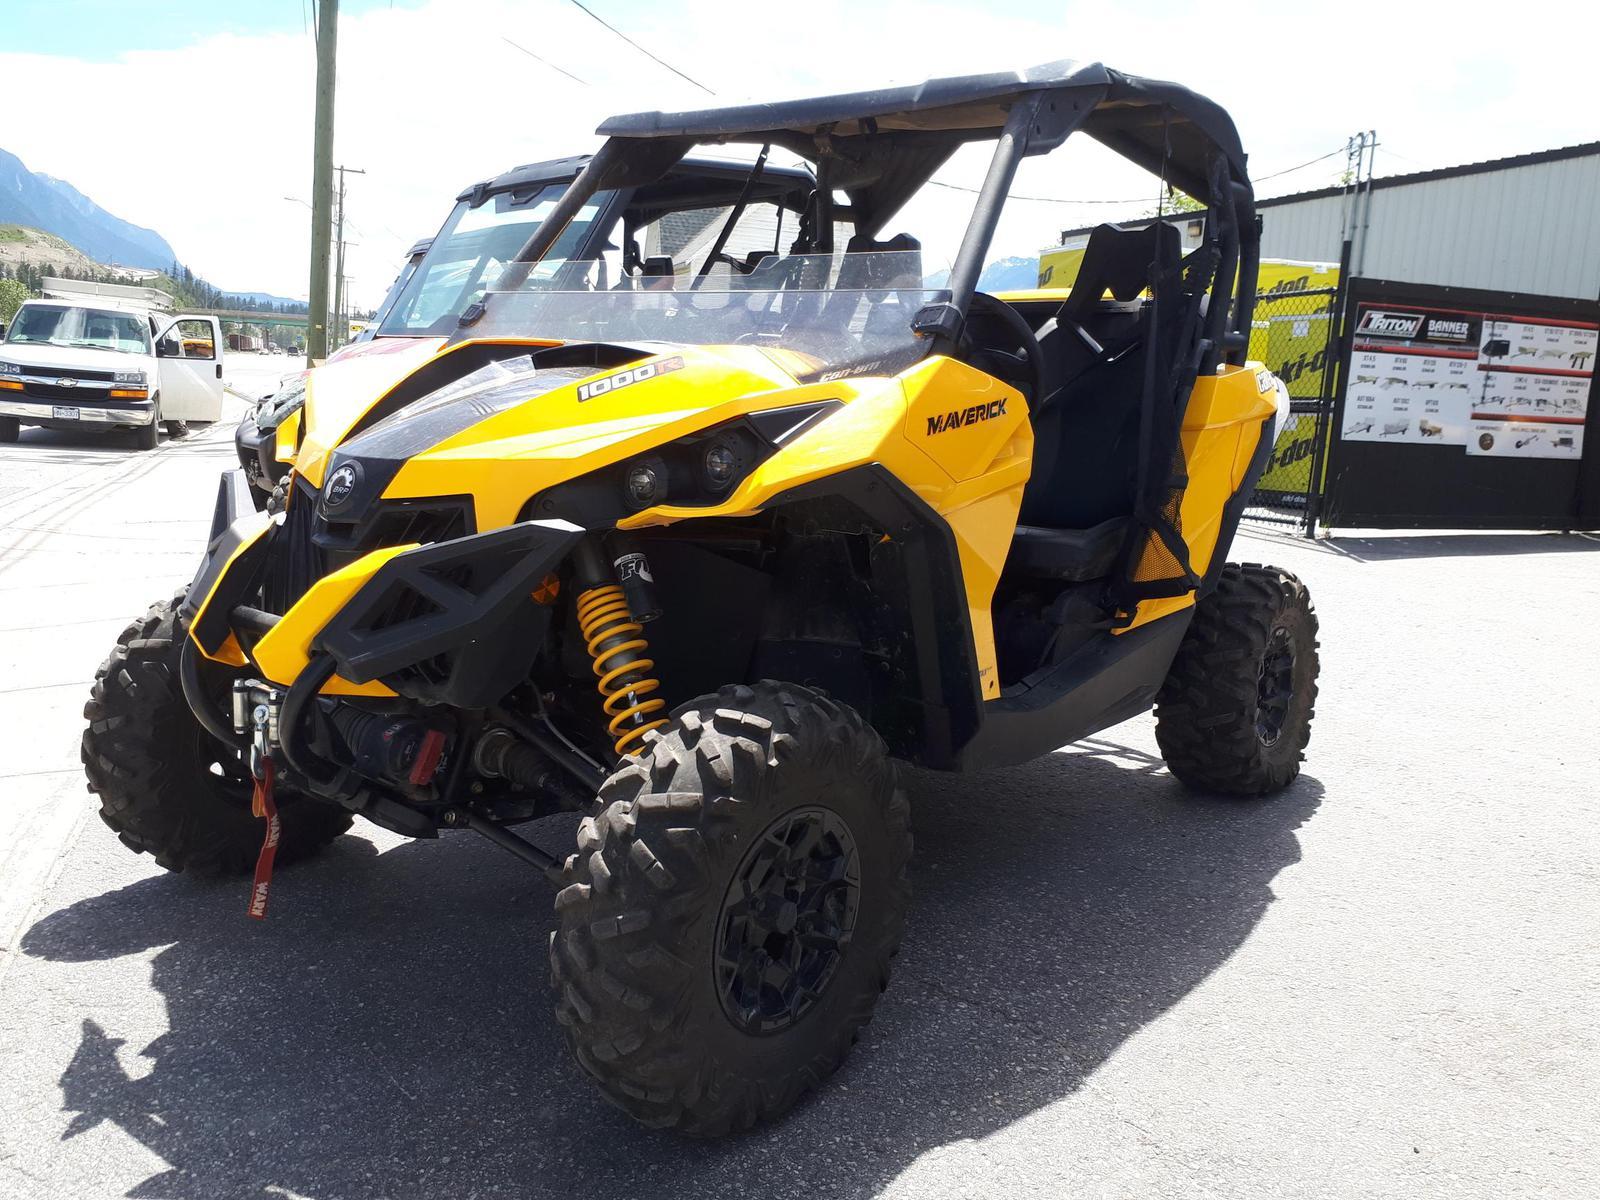 2013 Can-Am ATV Maverick 1000r